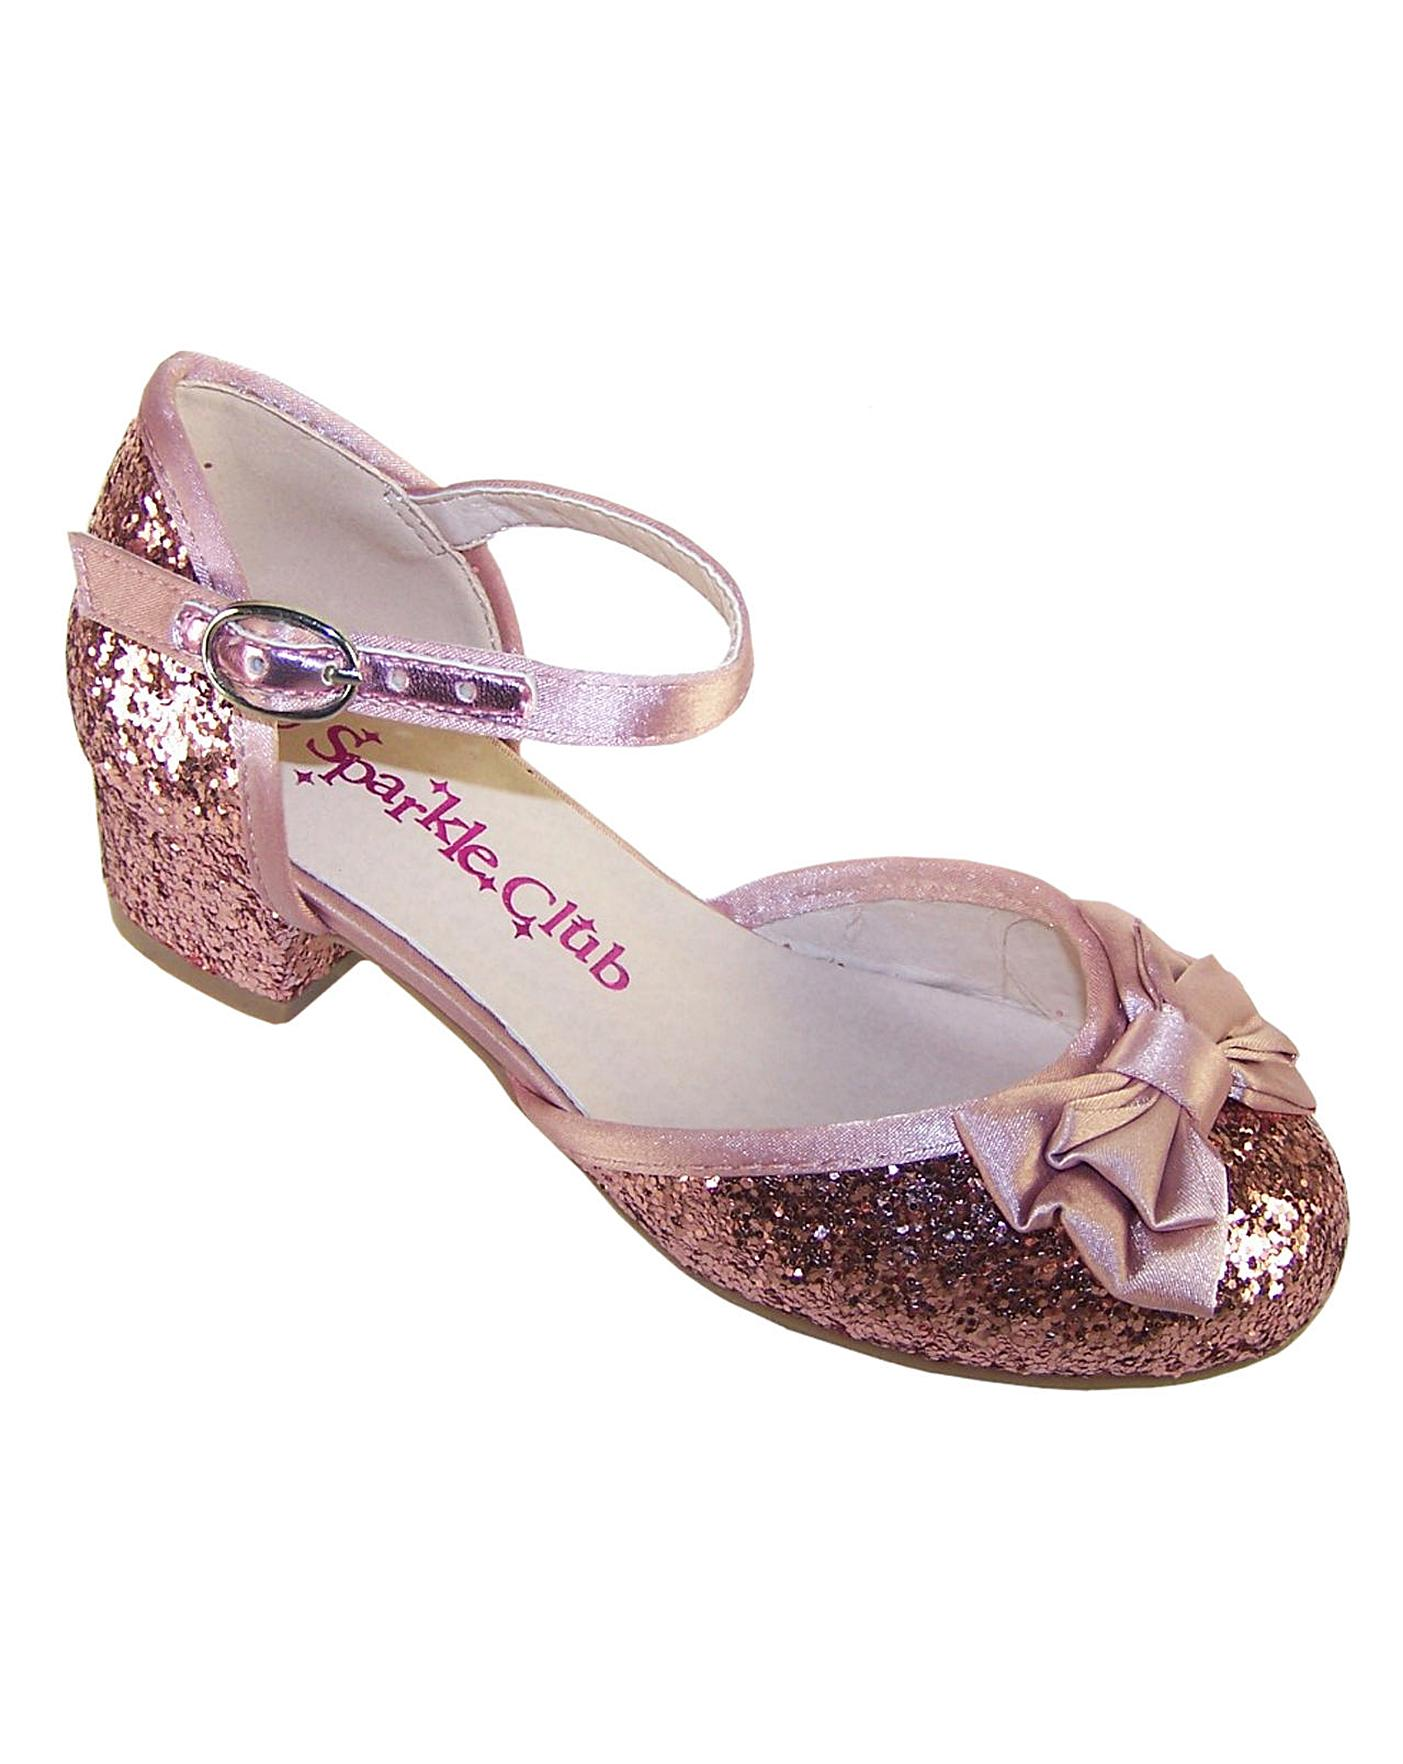 2d3bb9febfbd Sparkle Club Pink Glitter Shoes